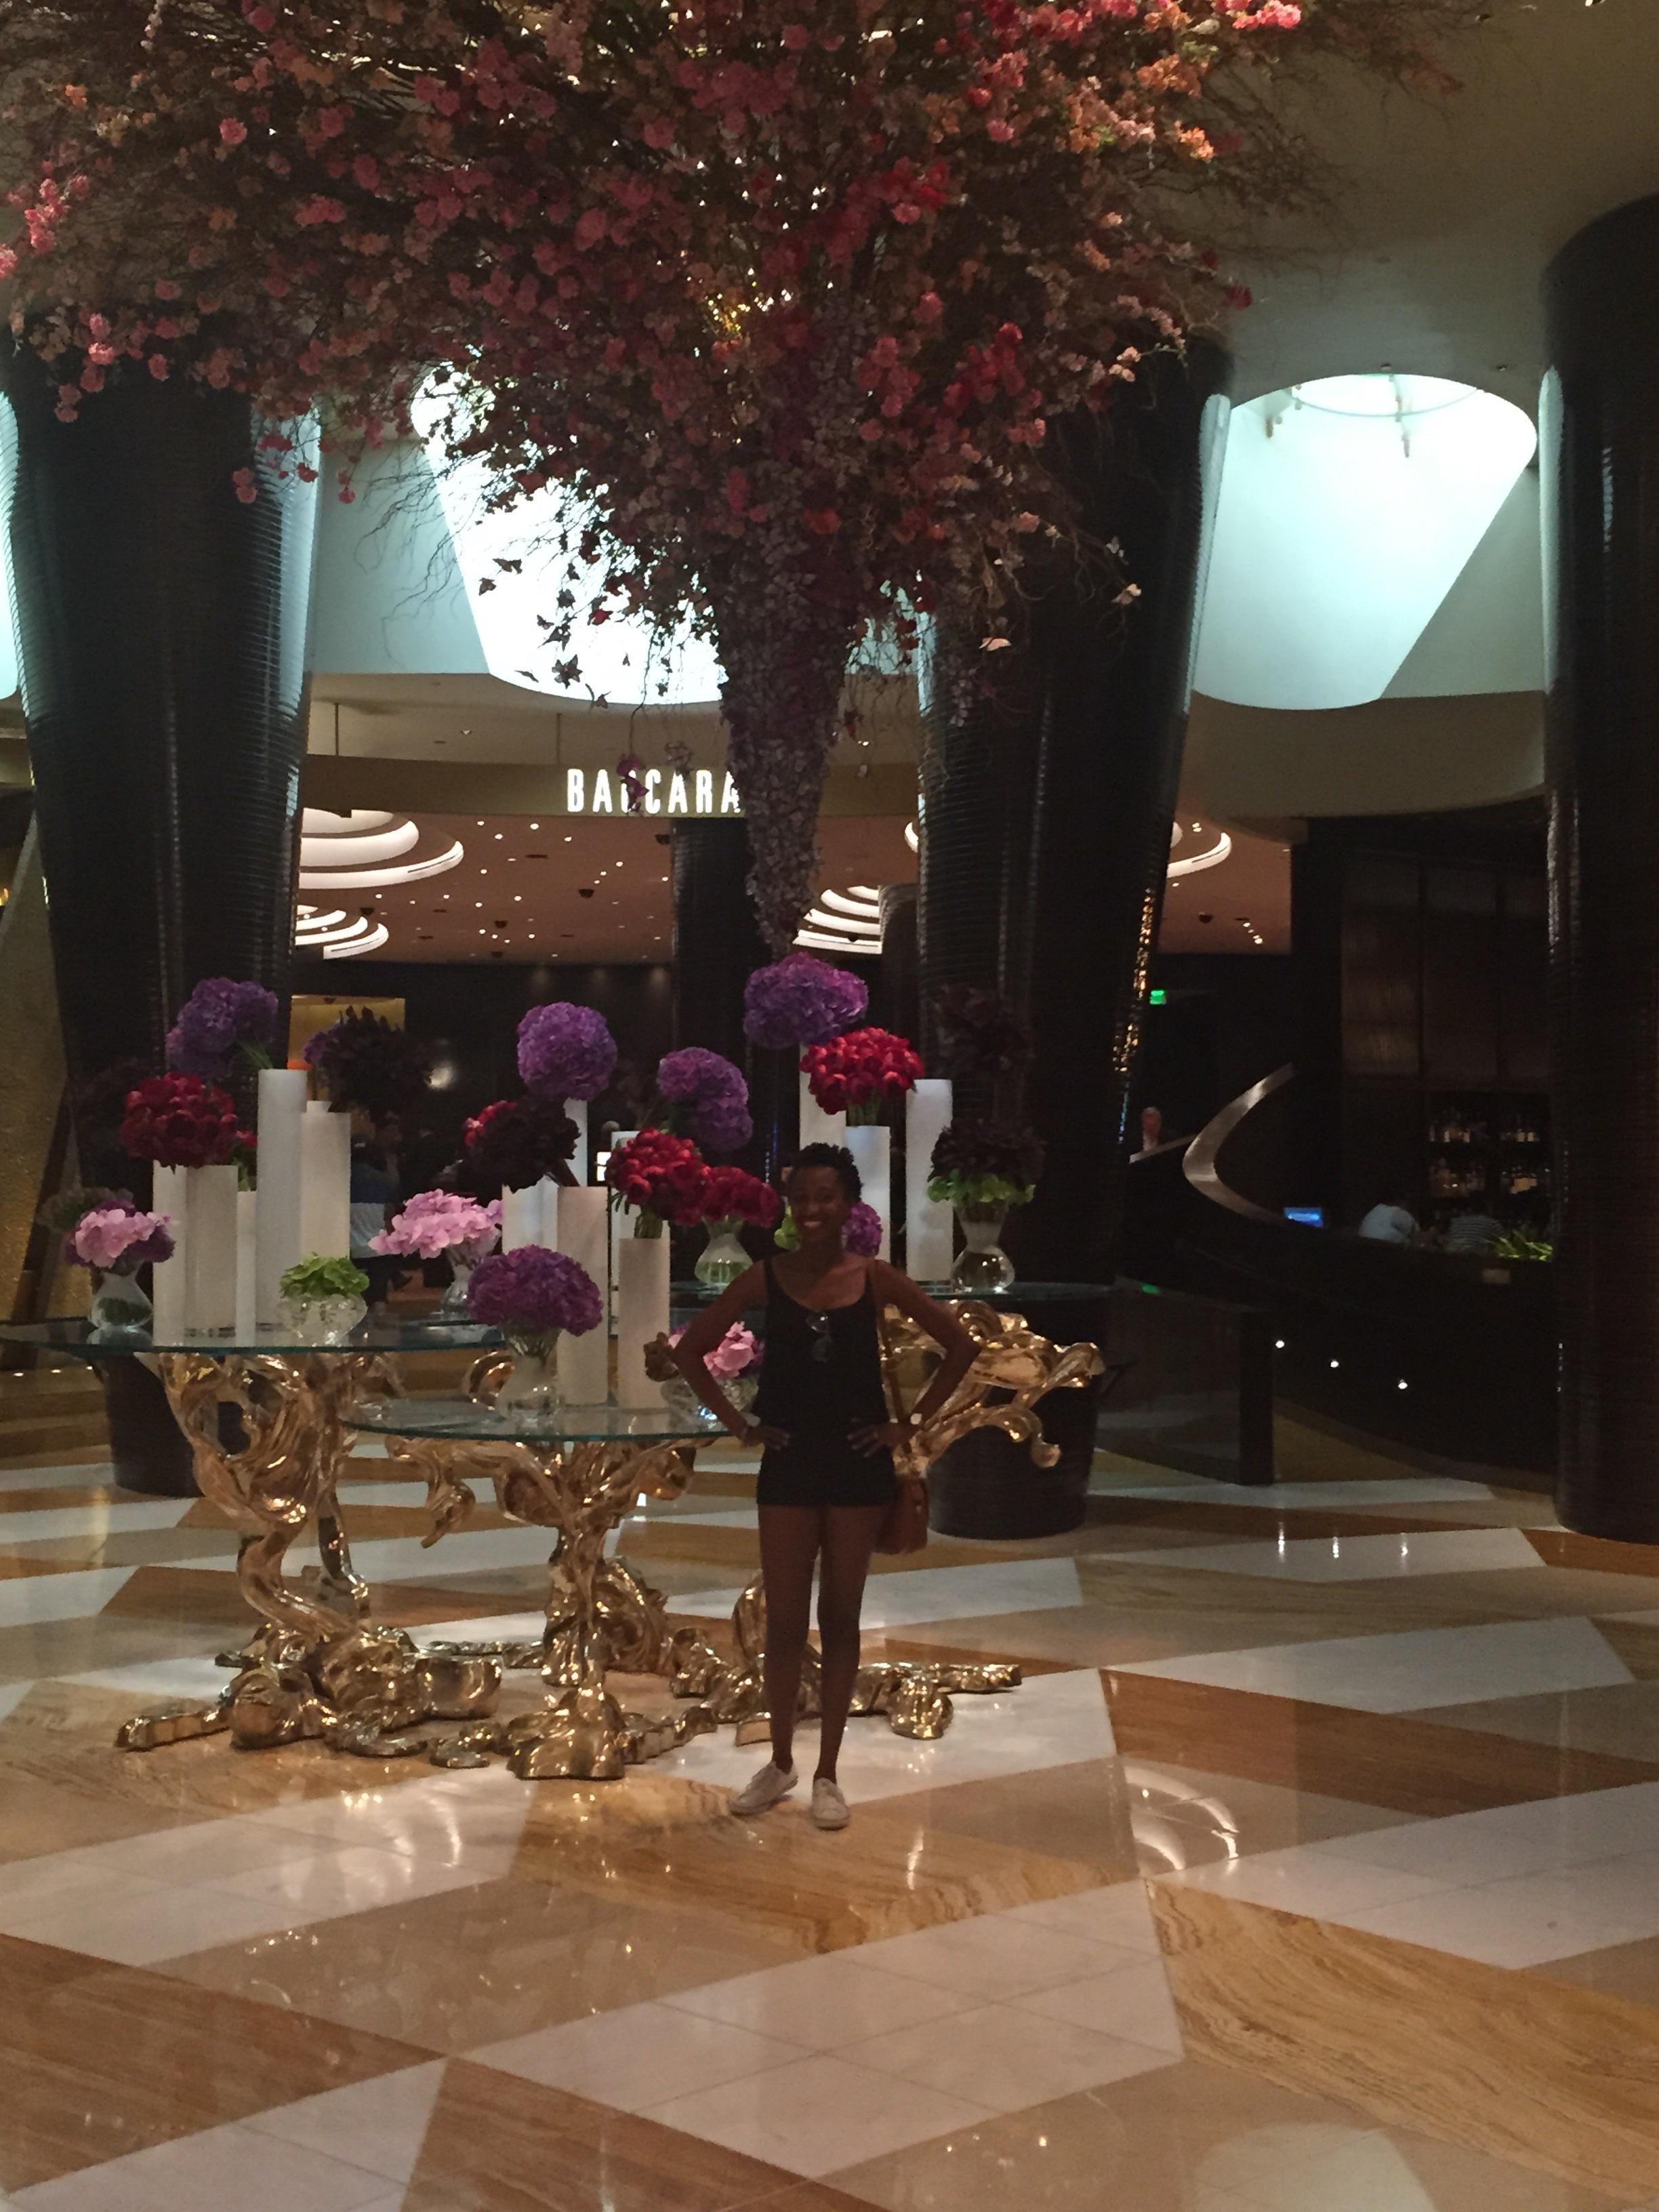 Photo II with flowers; Vegas turned me into a flower-backdrop kinda gal